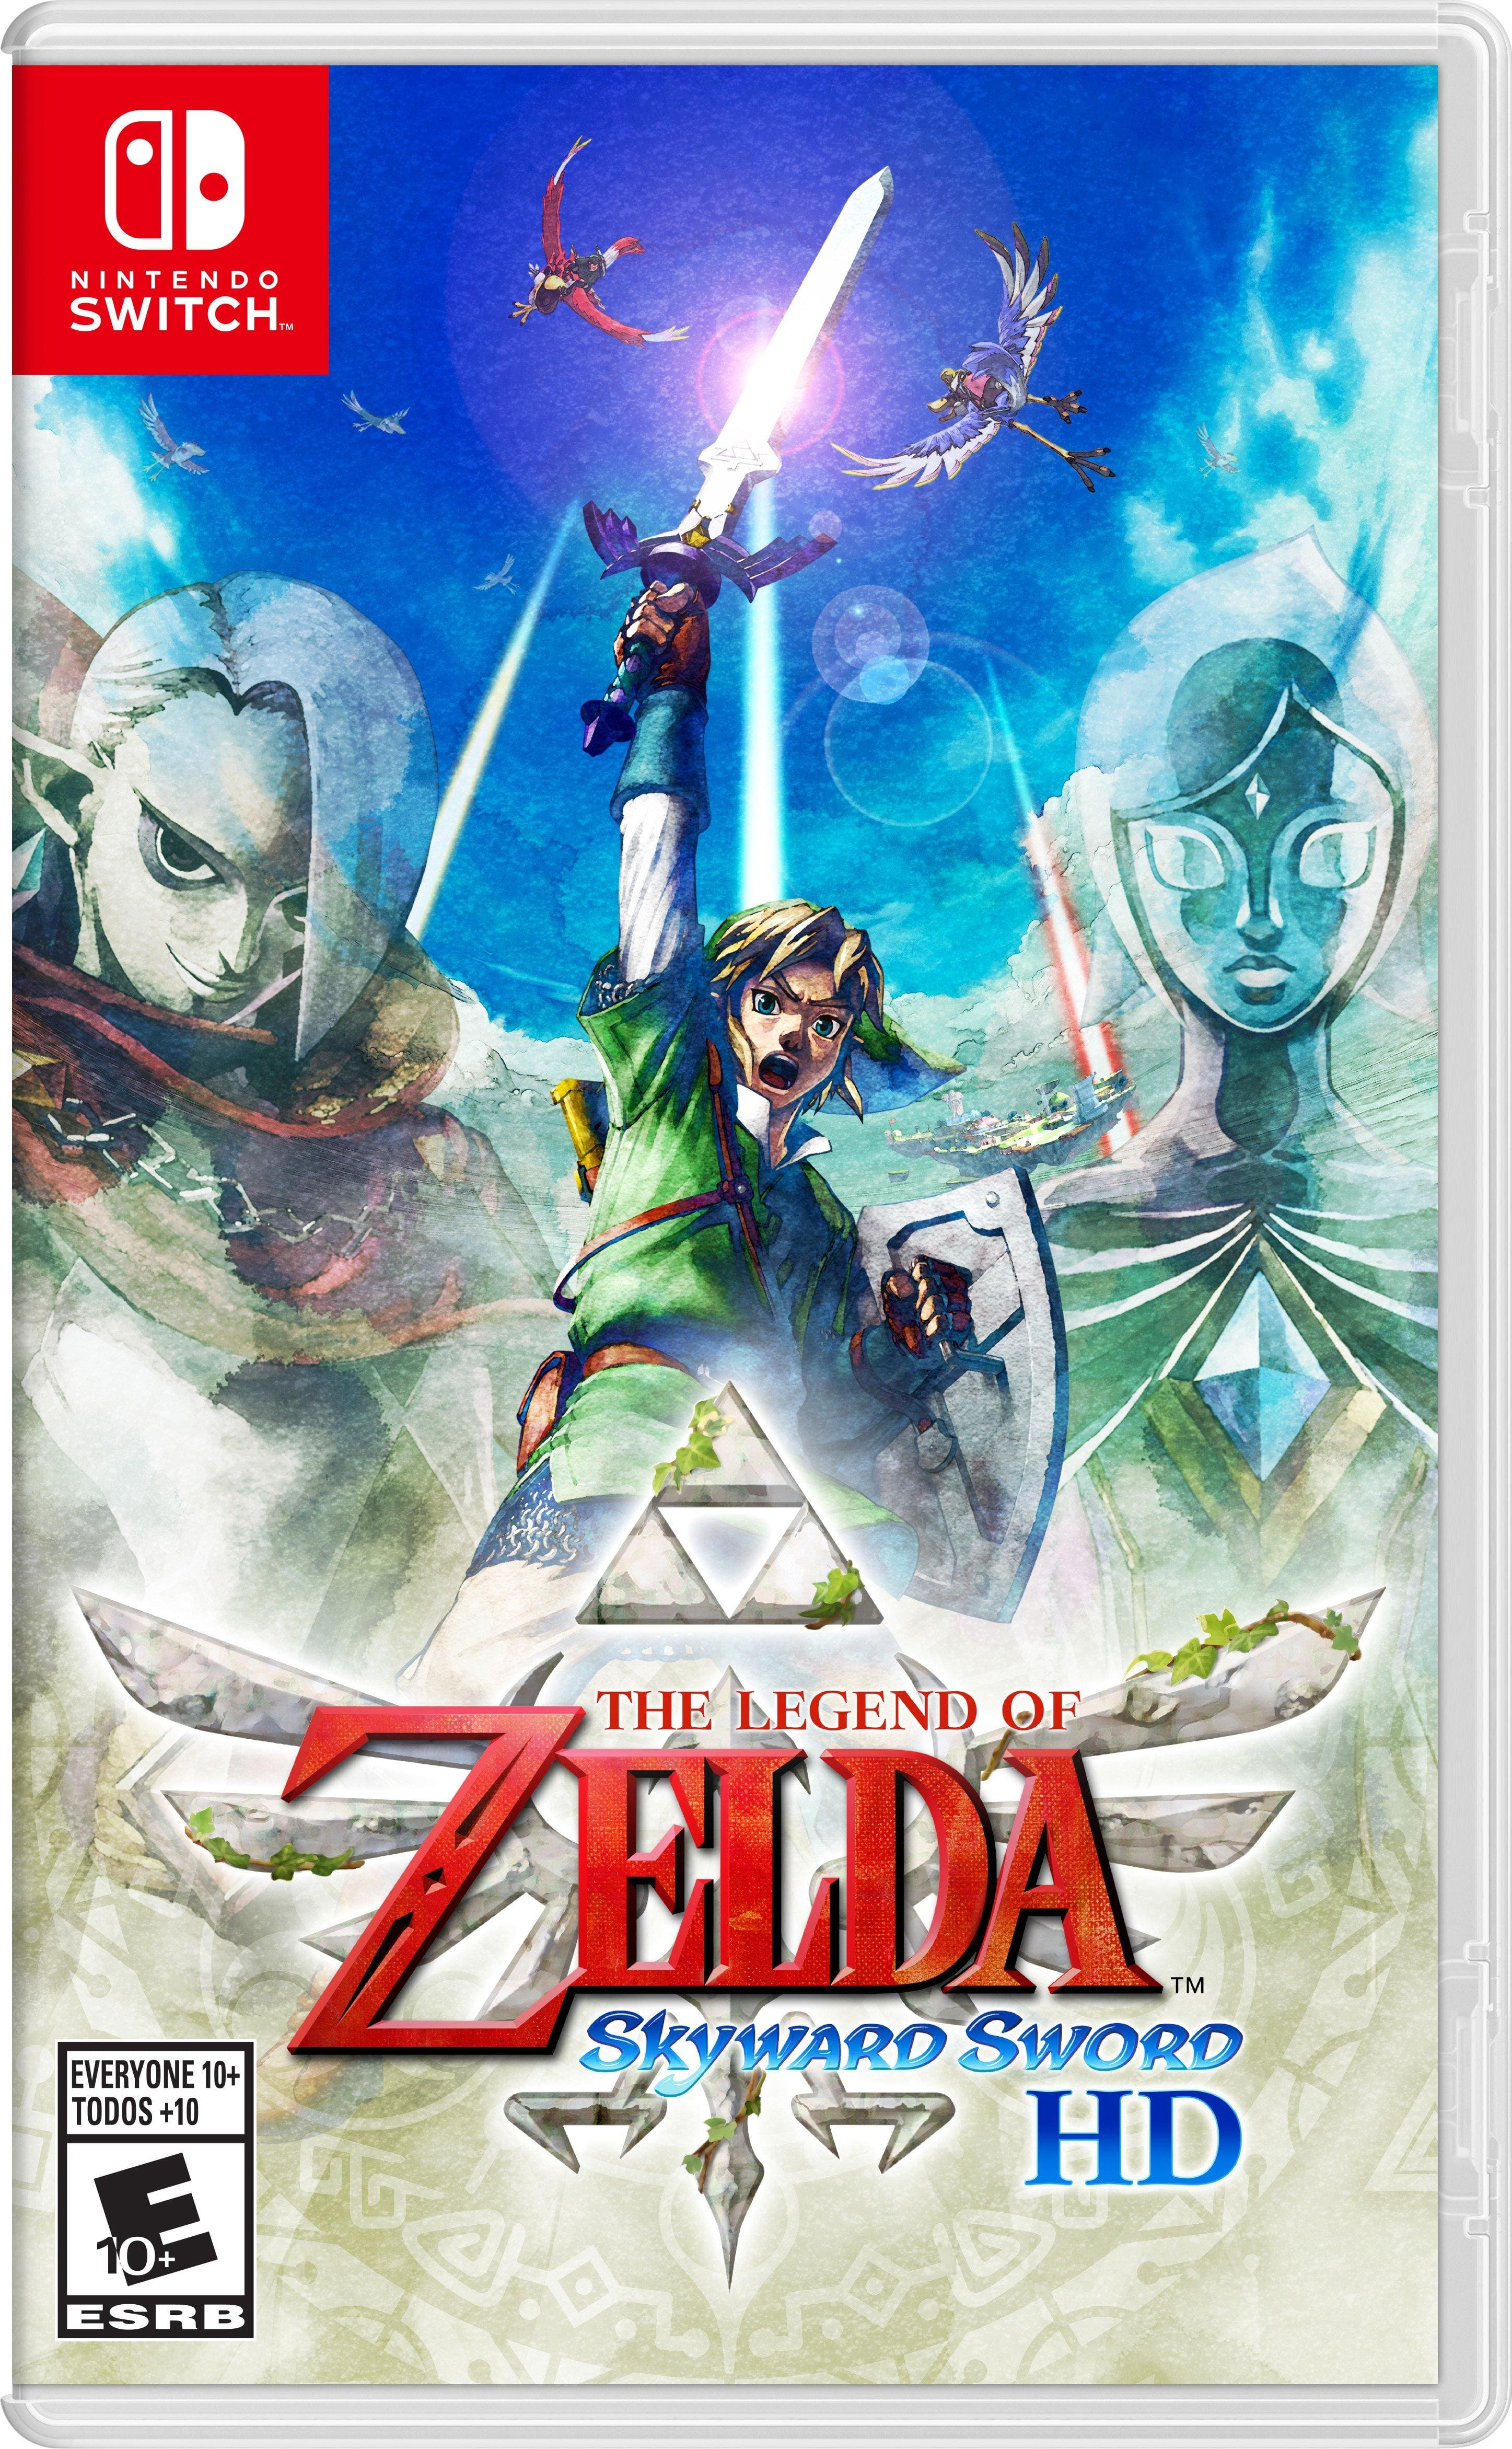 The Legend of Zelda: Skyward Sword HD   Nintendo Switch   GameStop $44.99 pre-owned